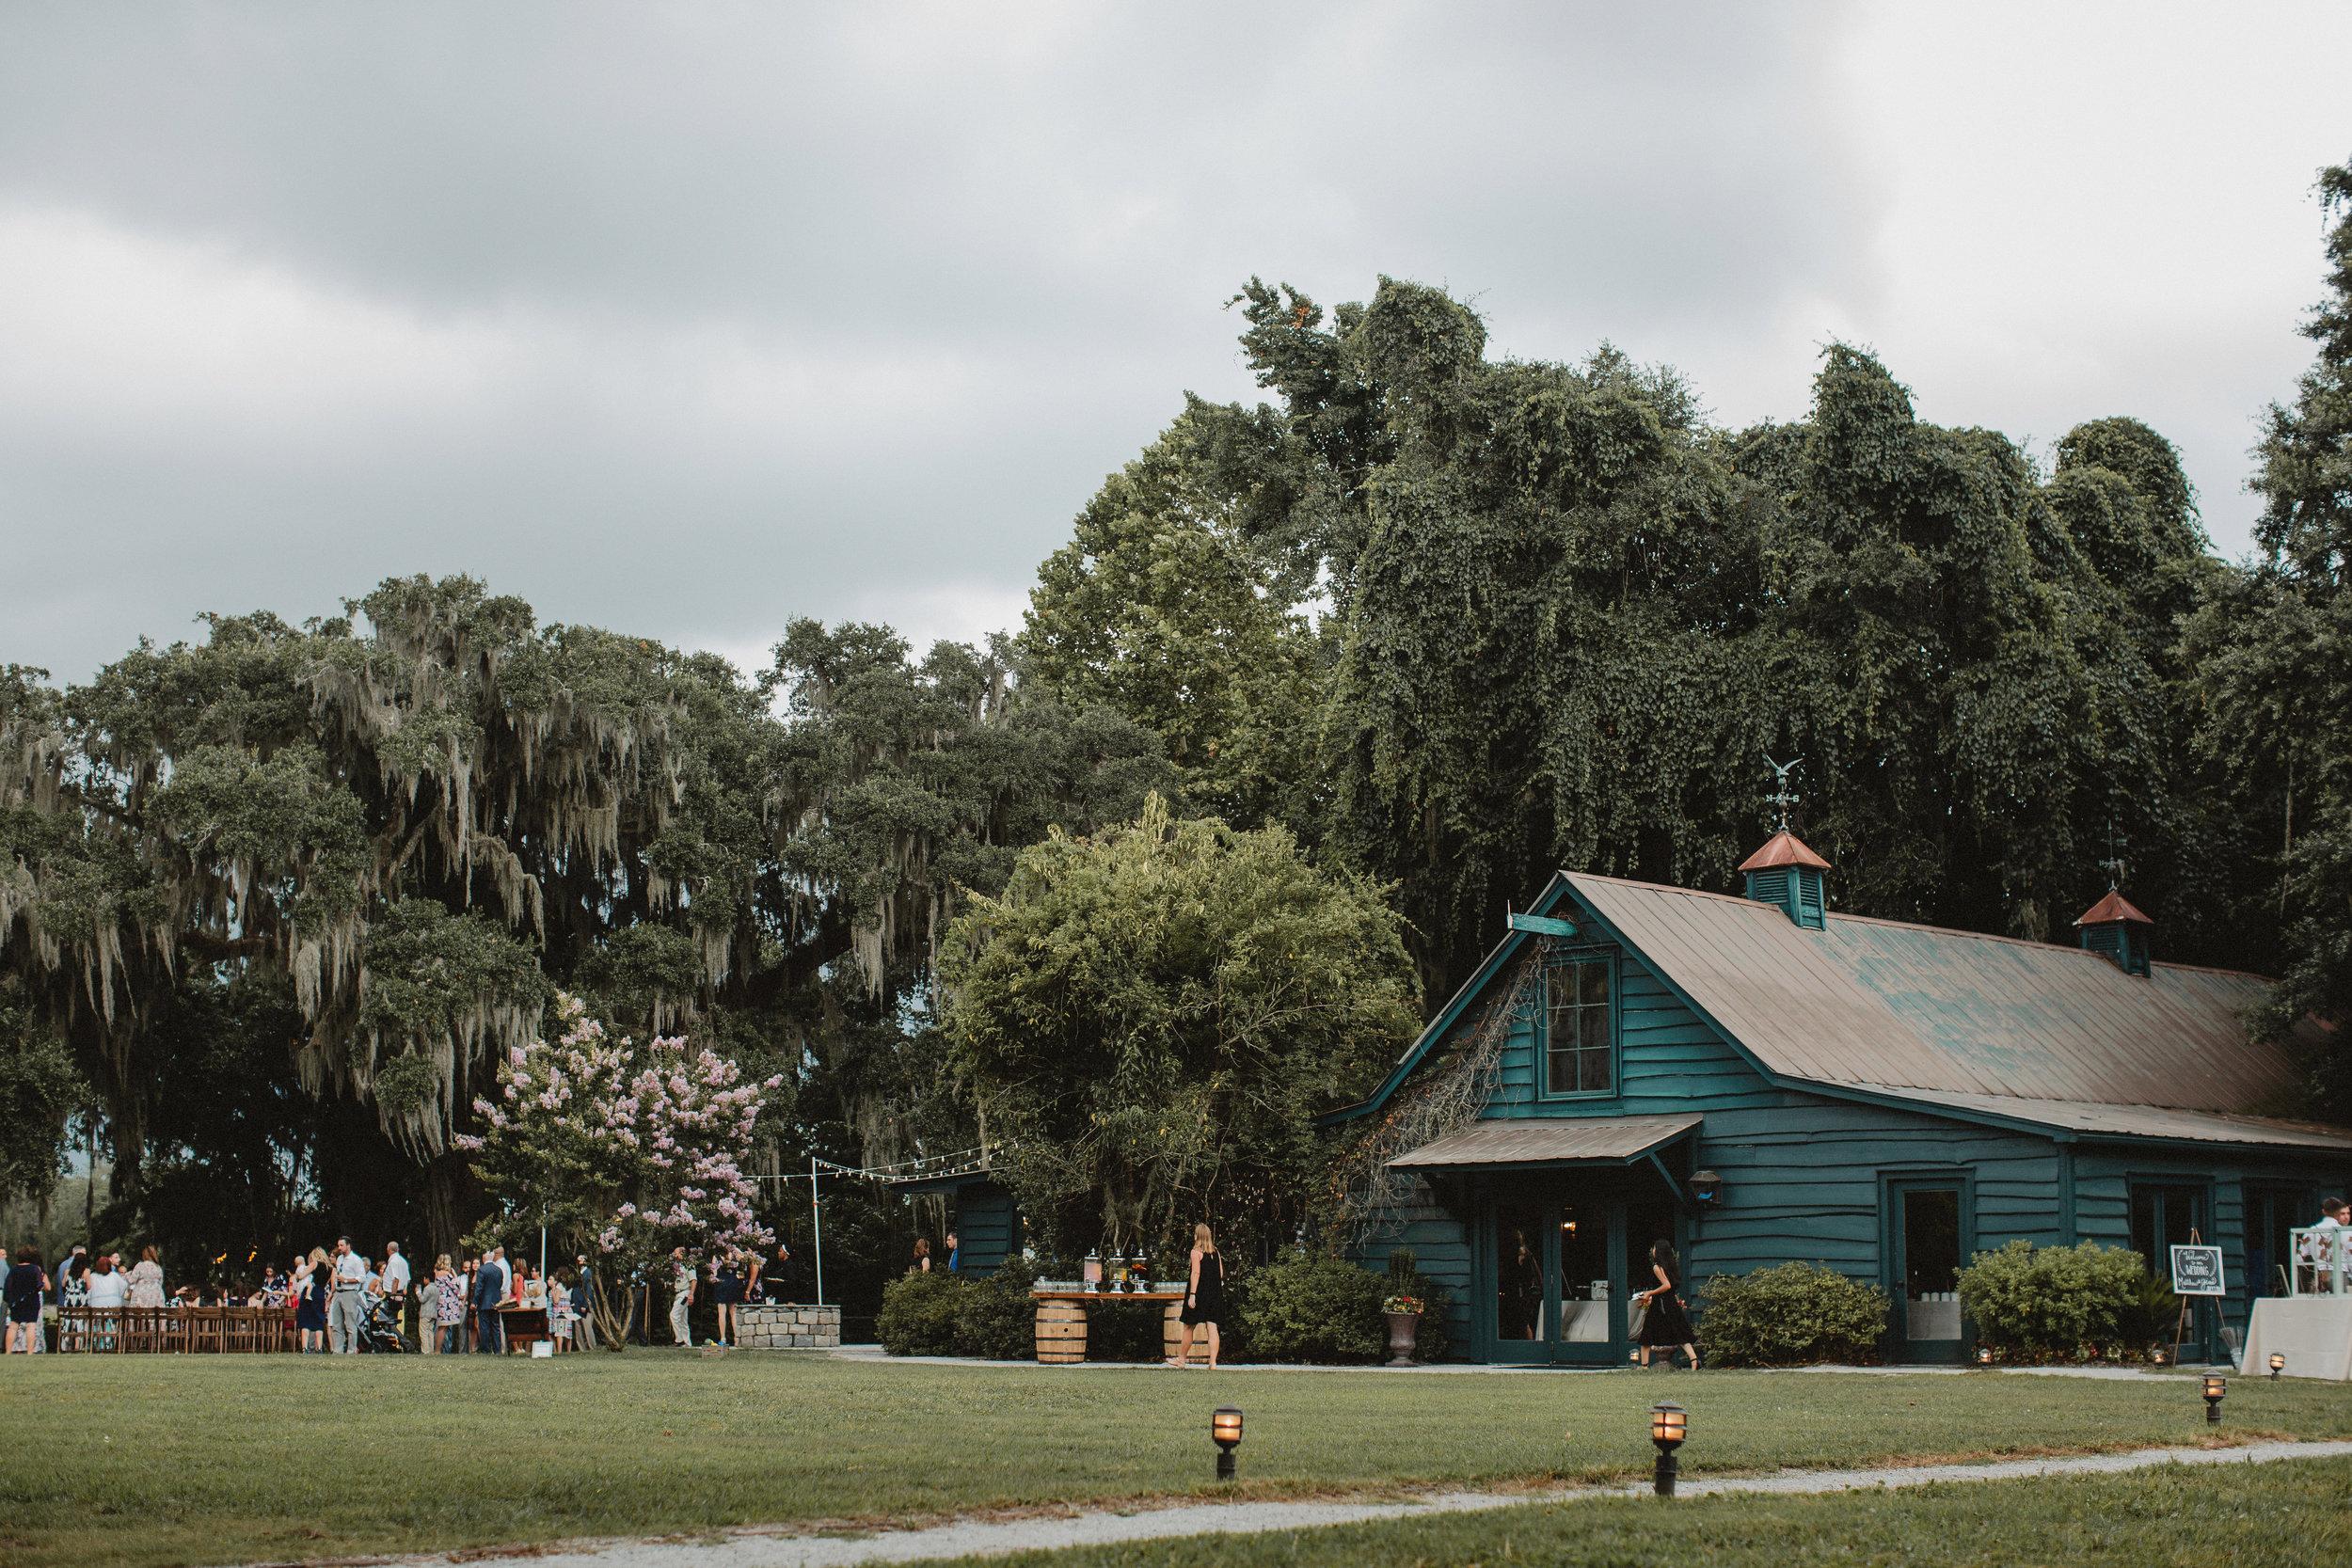 Carriage House at Magnolia Plantation